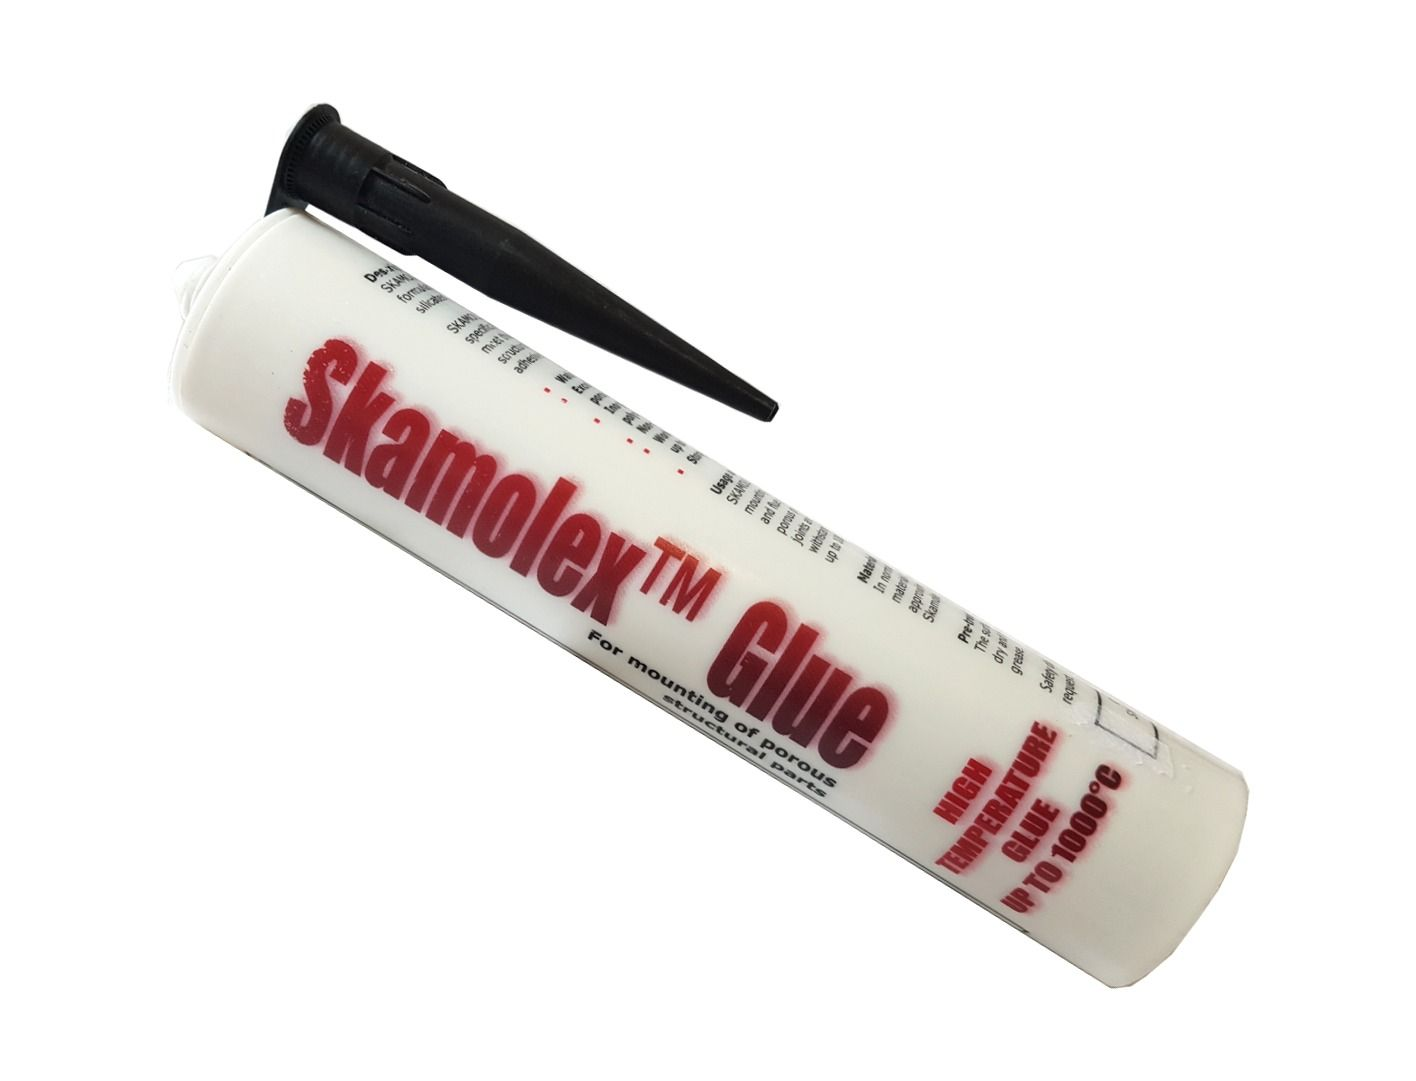 KRATKI lepidlo SKAMOLEX GLUE - kartuš 450g Silaterm